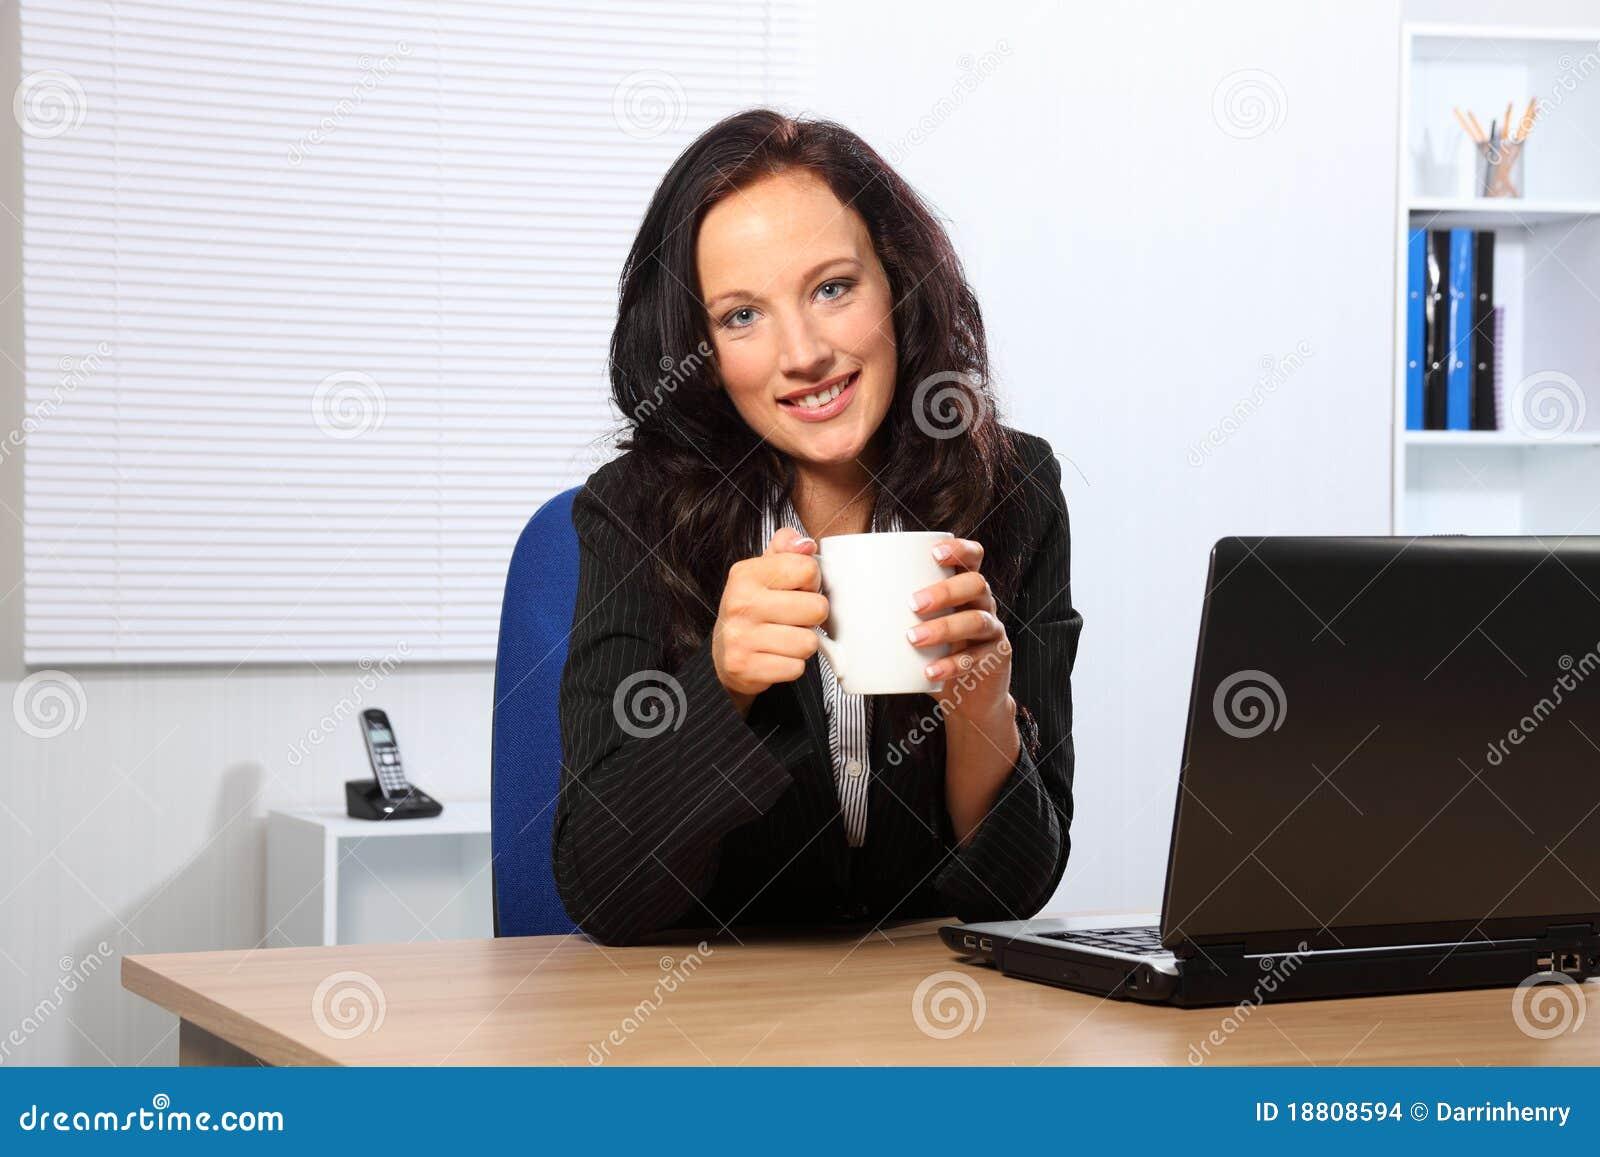 Coffee Break For Beautiful Woman At Office Desk Stock